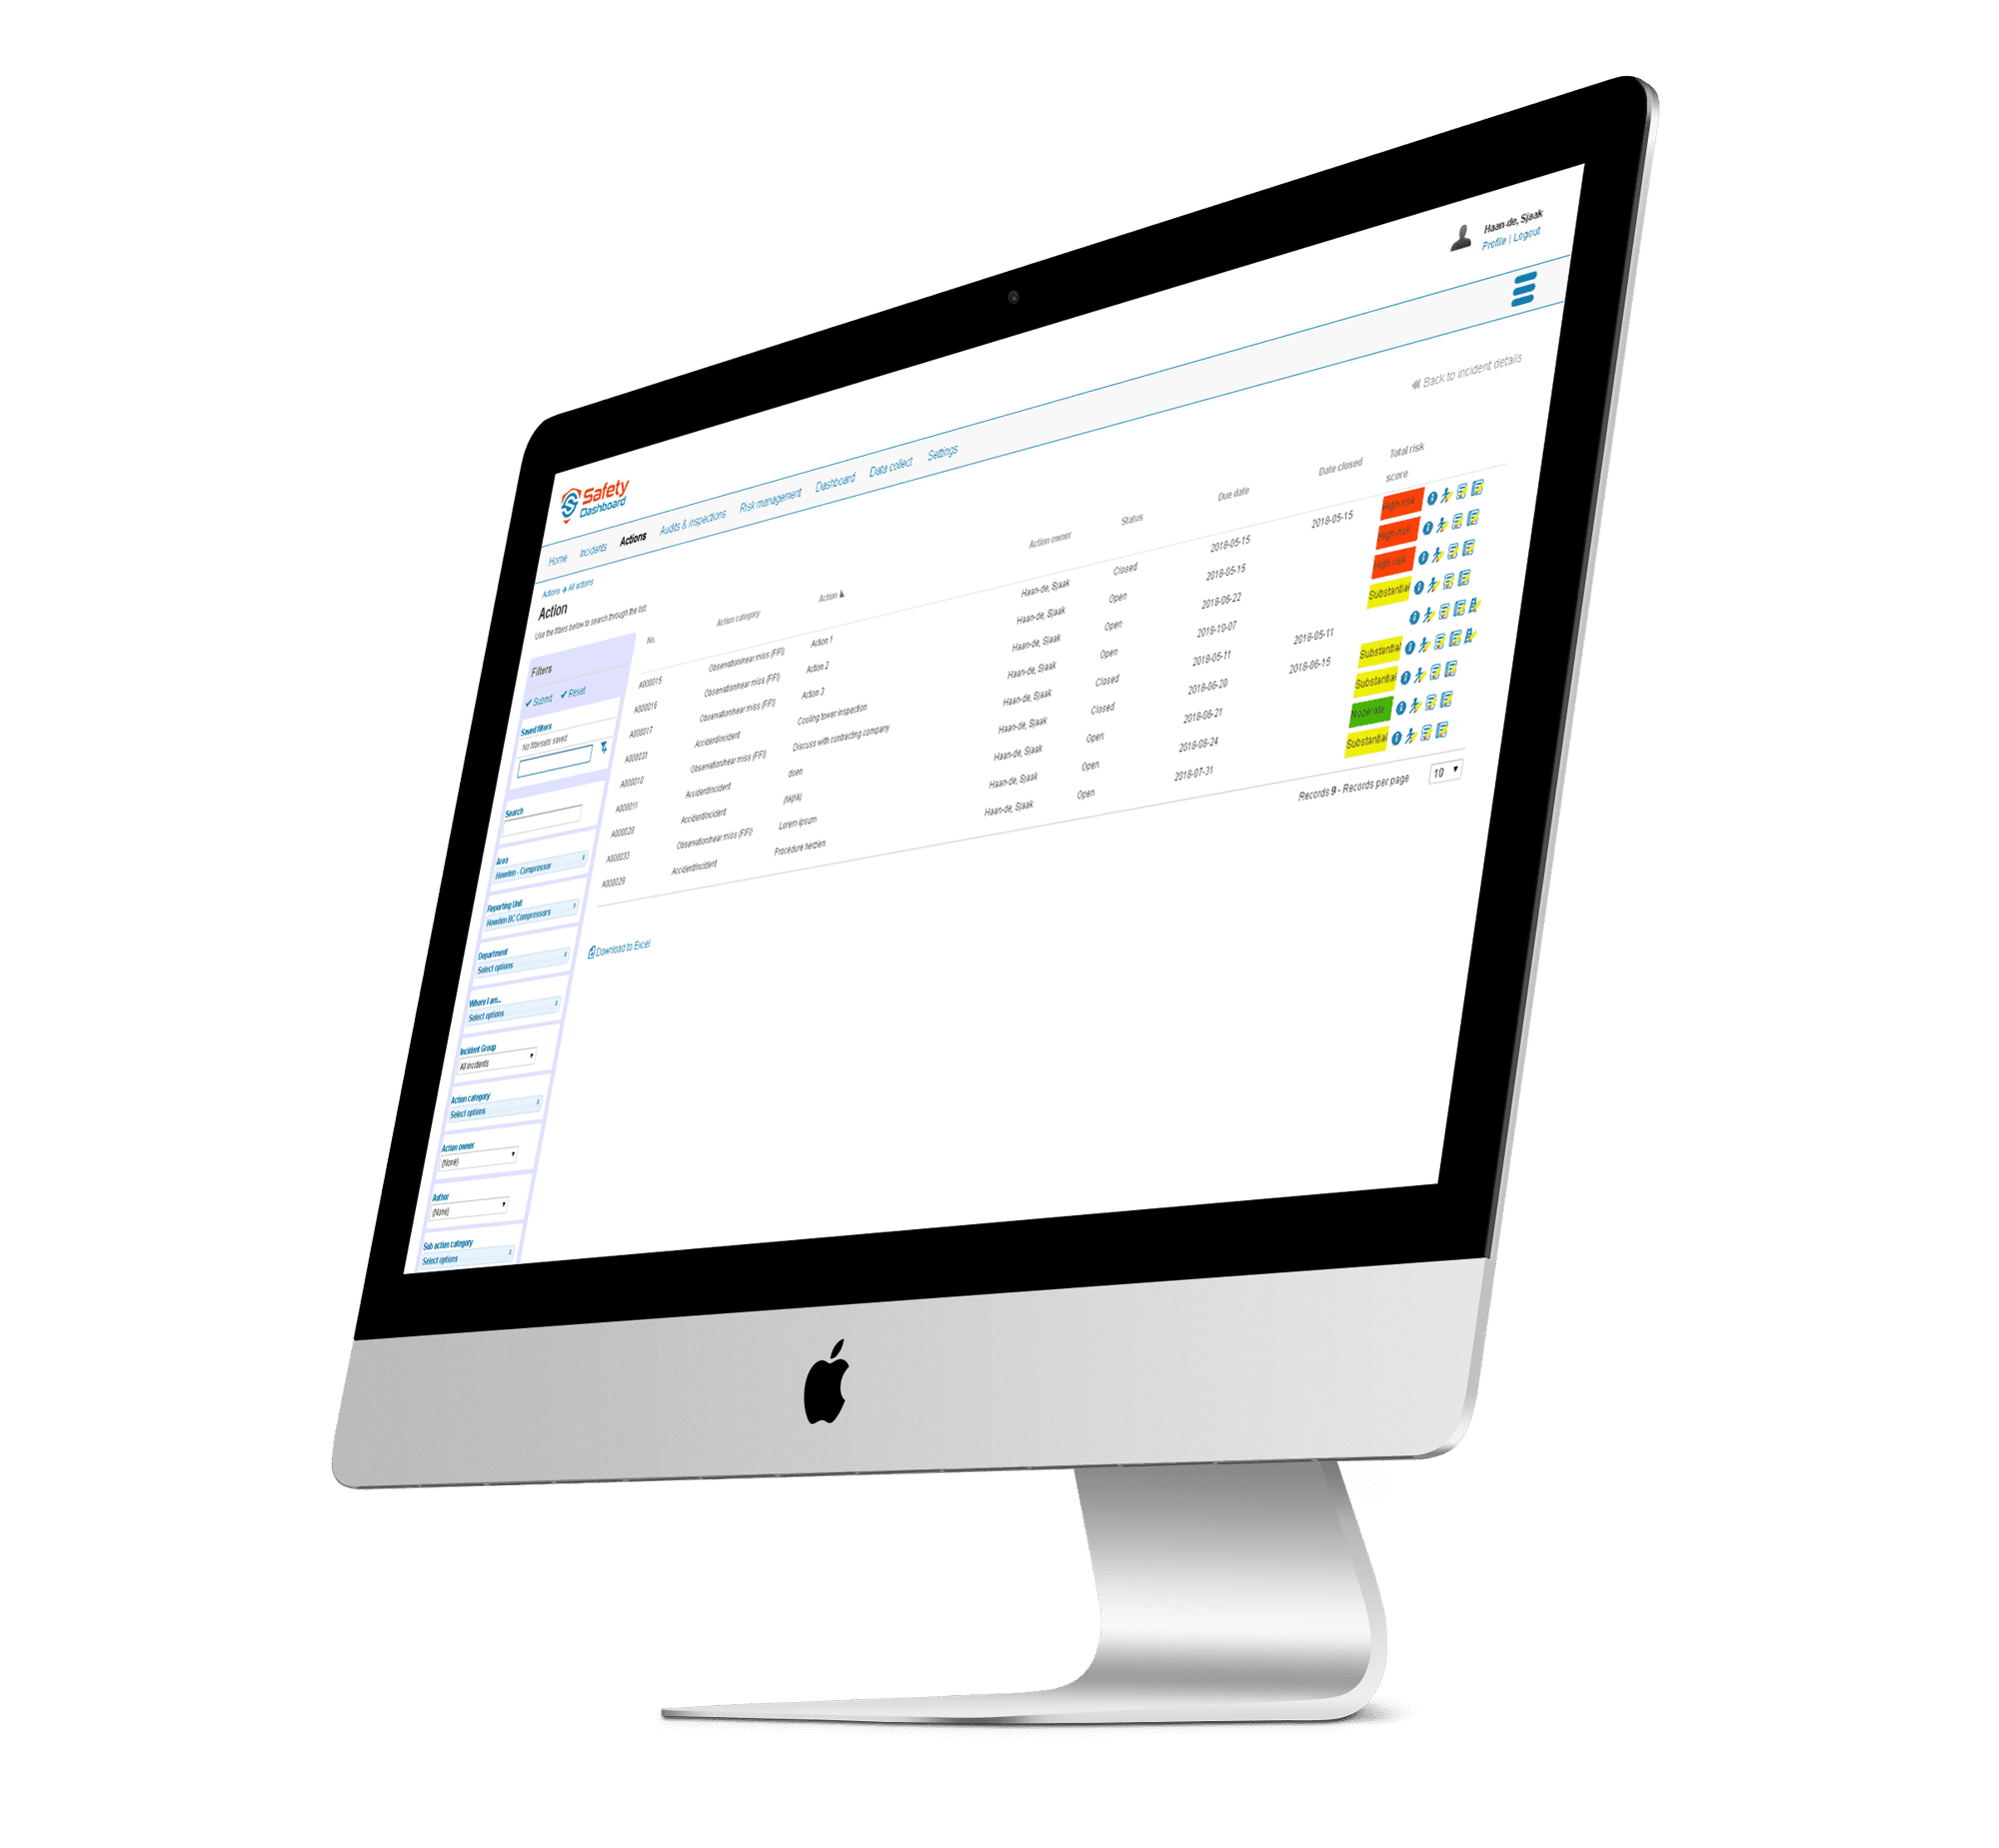 EHS management dashboard software